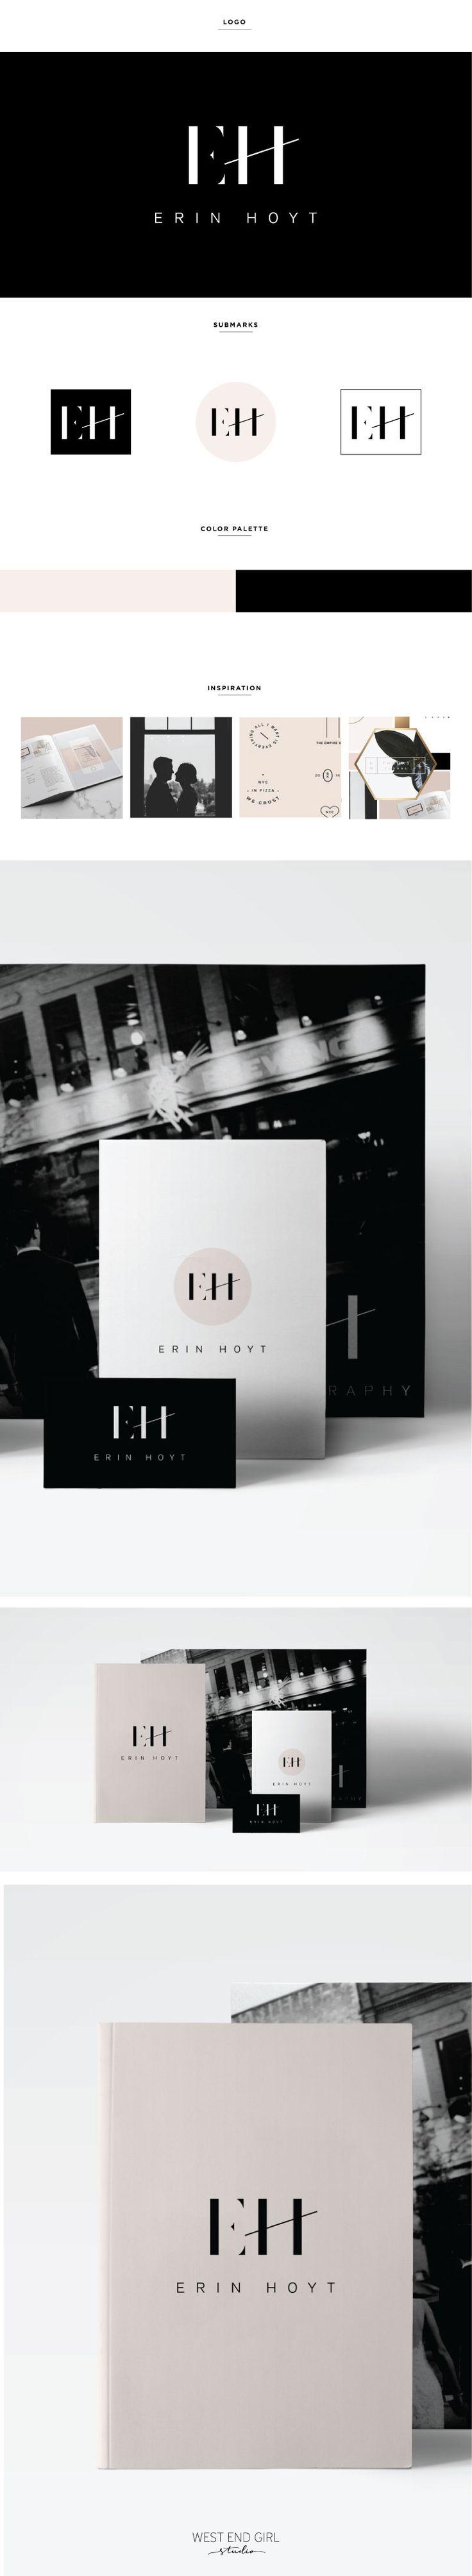 clean, modern, minimal, logo, photography branding, black and white logo